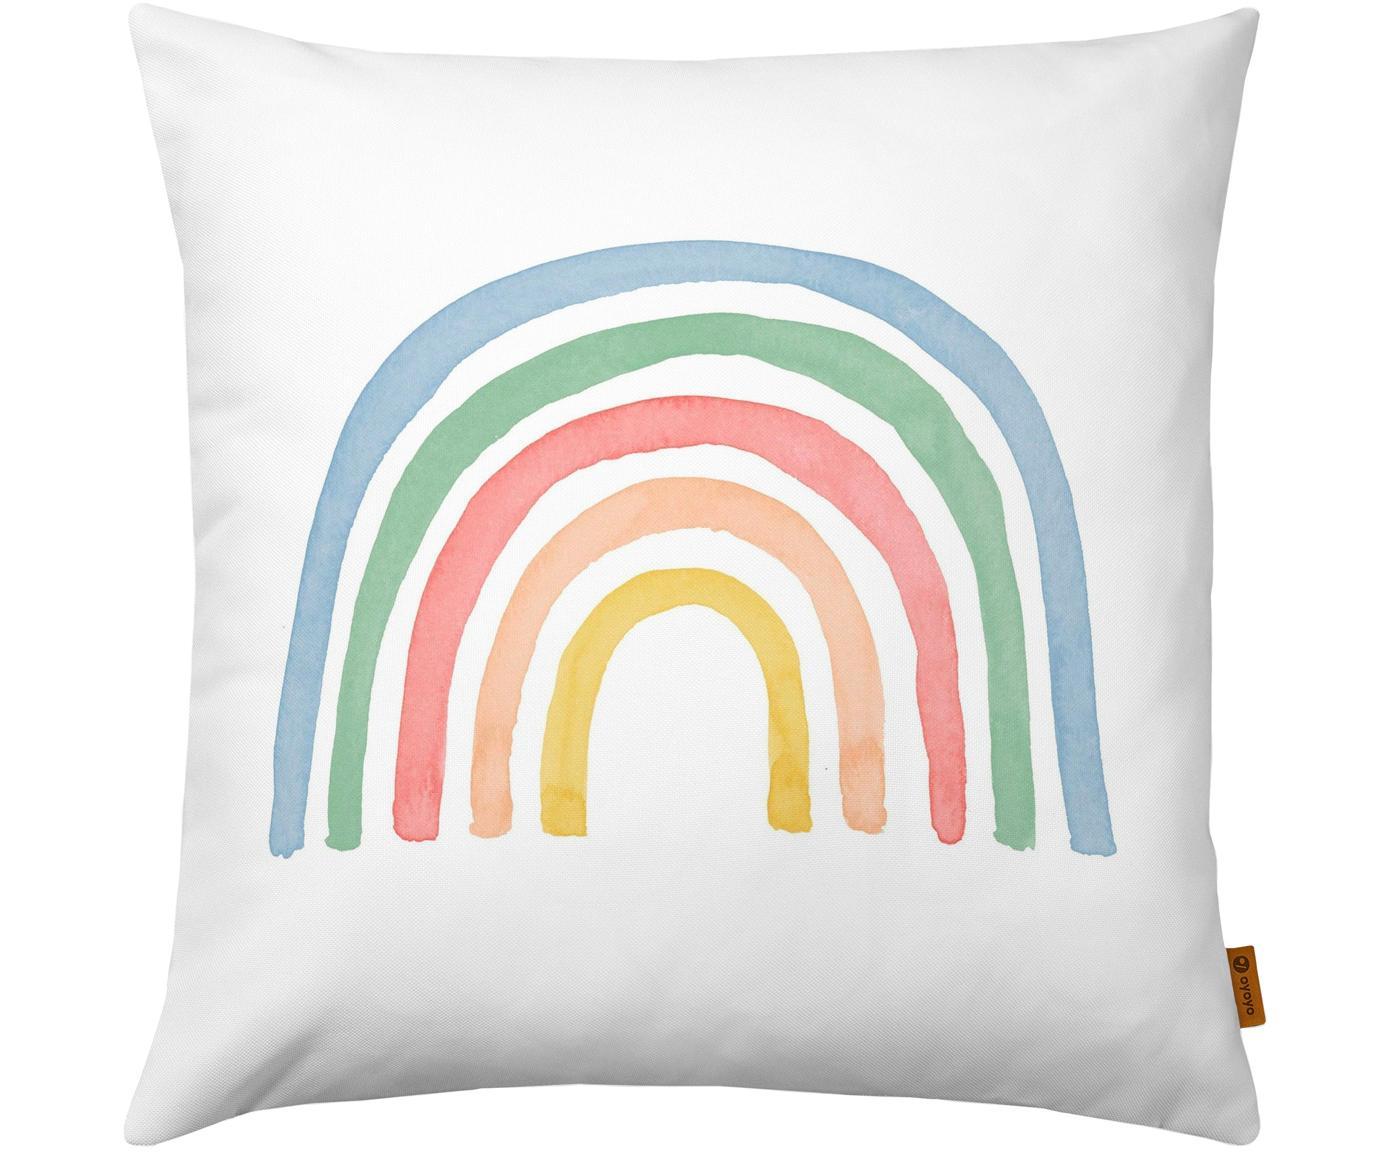 Kissenhülle Rainbow, Baumwolle, Weiss, Mehrfarbig, 40 x 40 cm